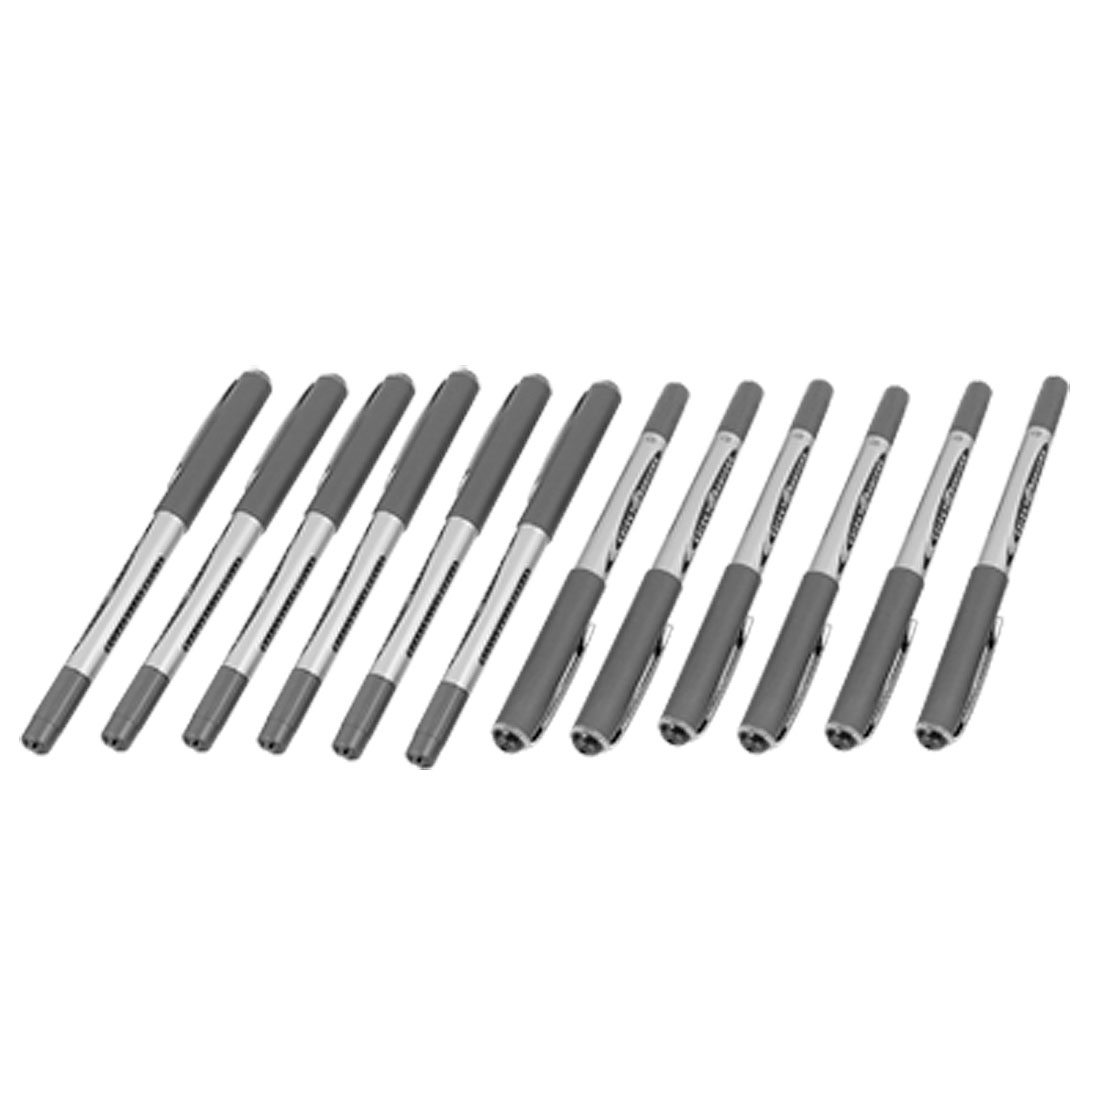 12 pcs Gray Shell Black Ink Writing 0.5mm Gel Pen